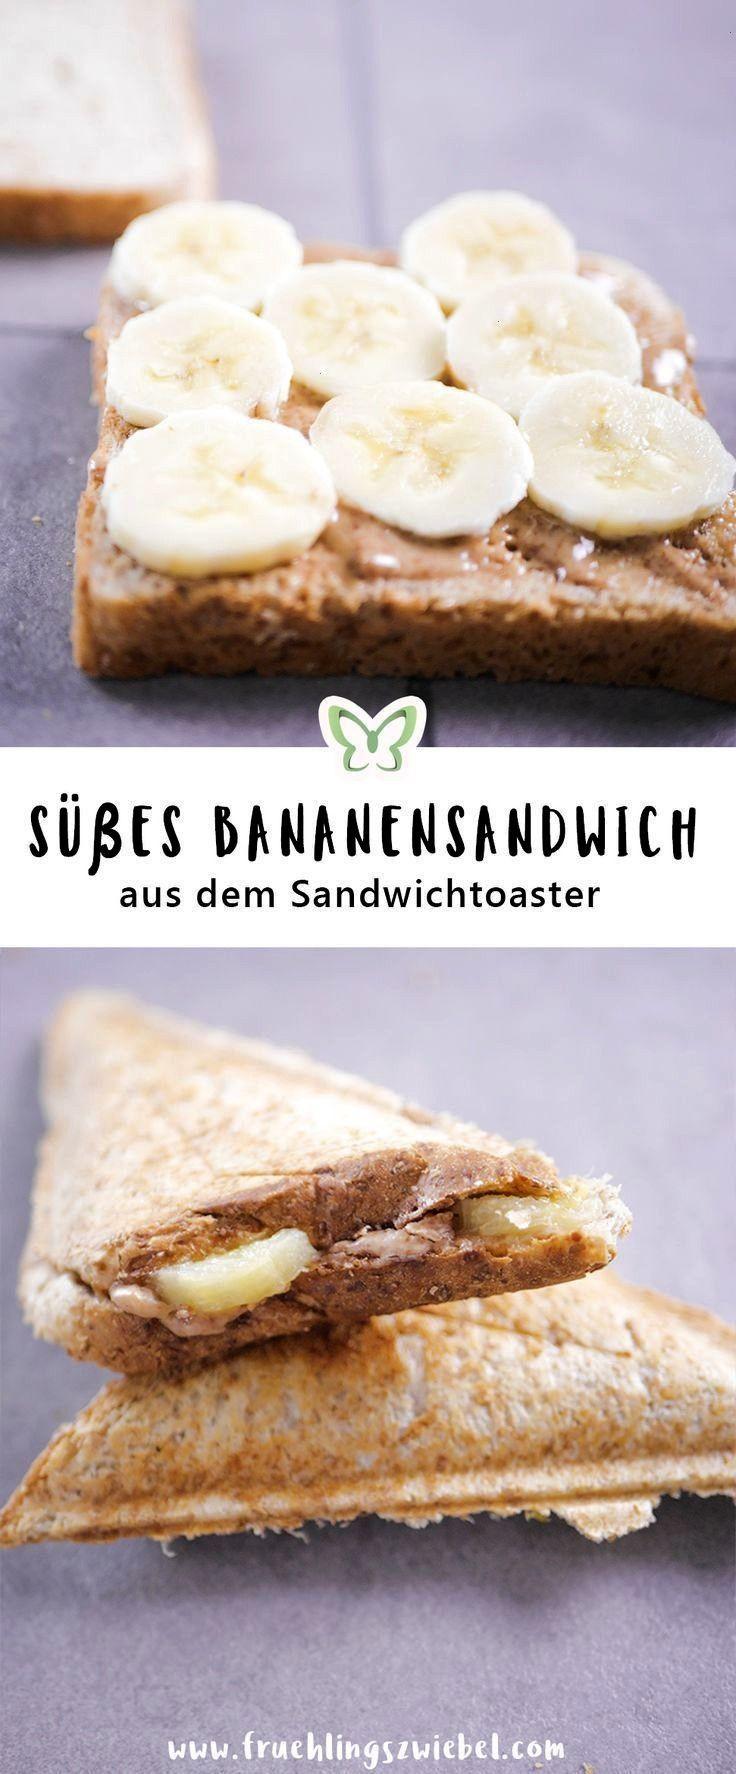 #bananenerdussbuttertoast #einfacherezepte #sandwichmaker #kalorienarme #zubereitung #gefallen #abne...